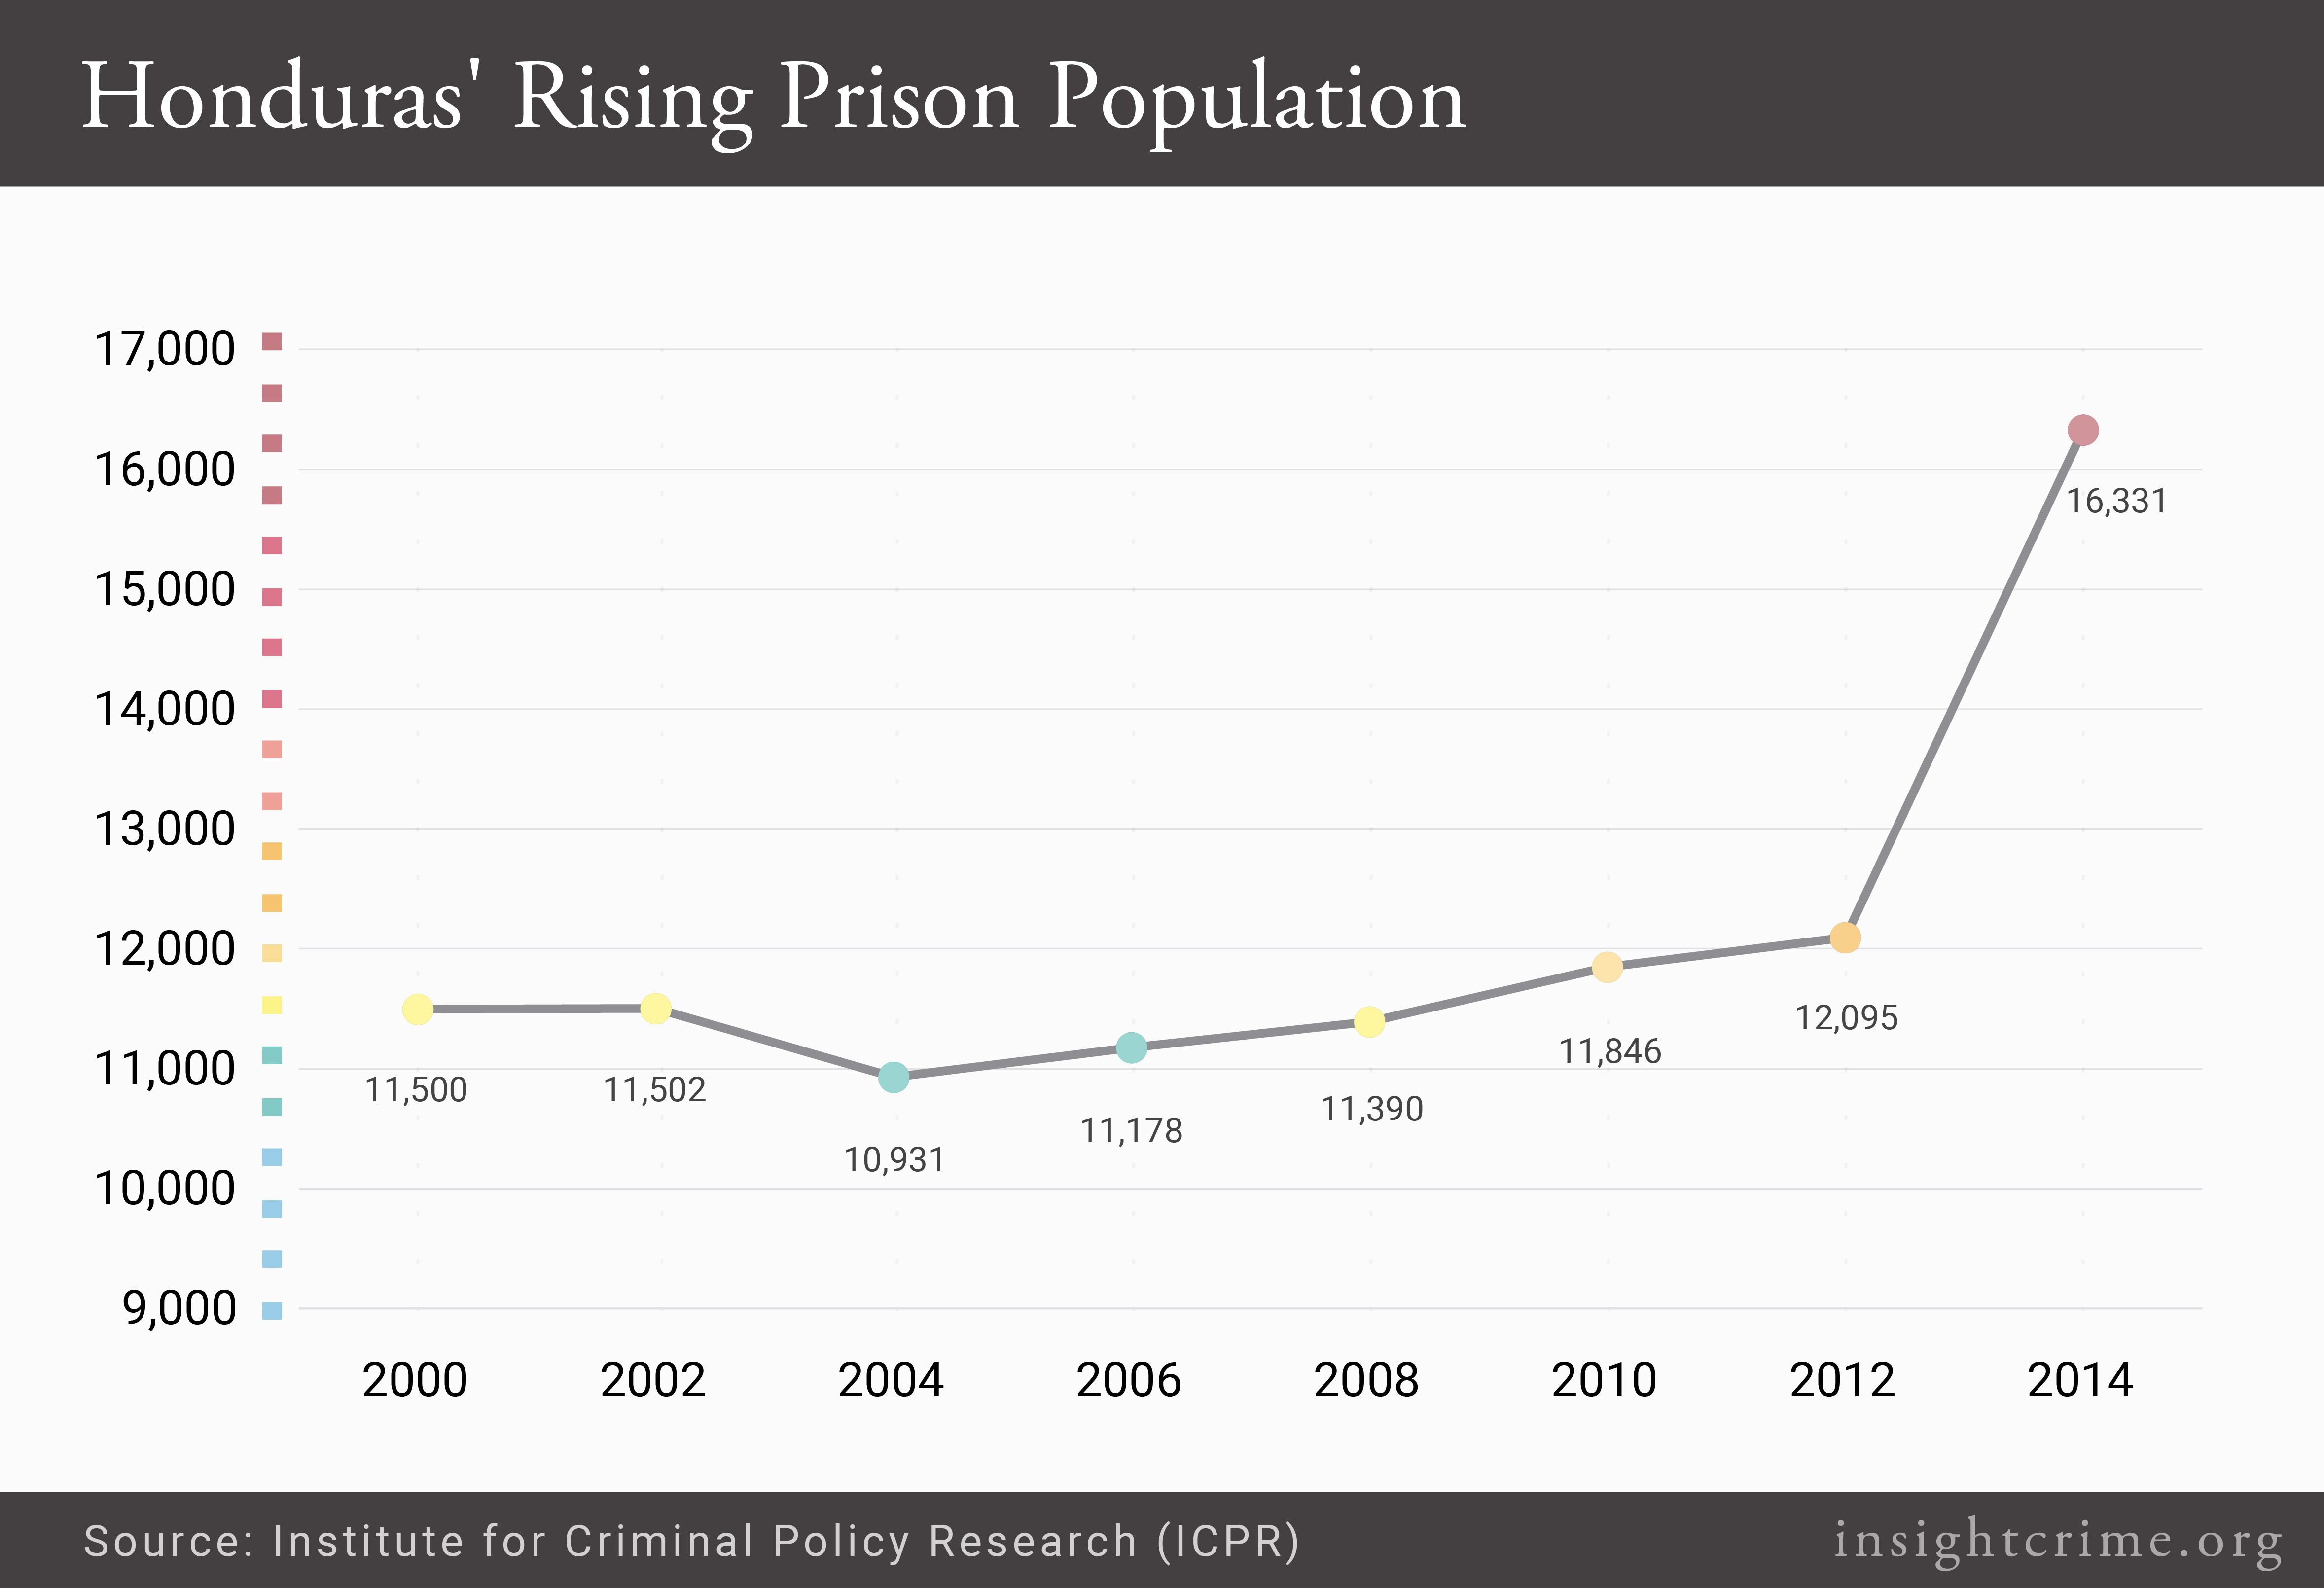 Honduras Rising Prison Population